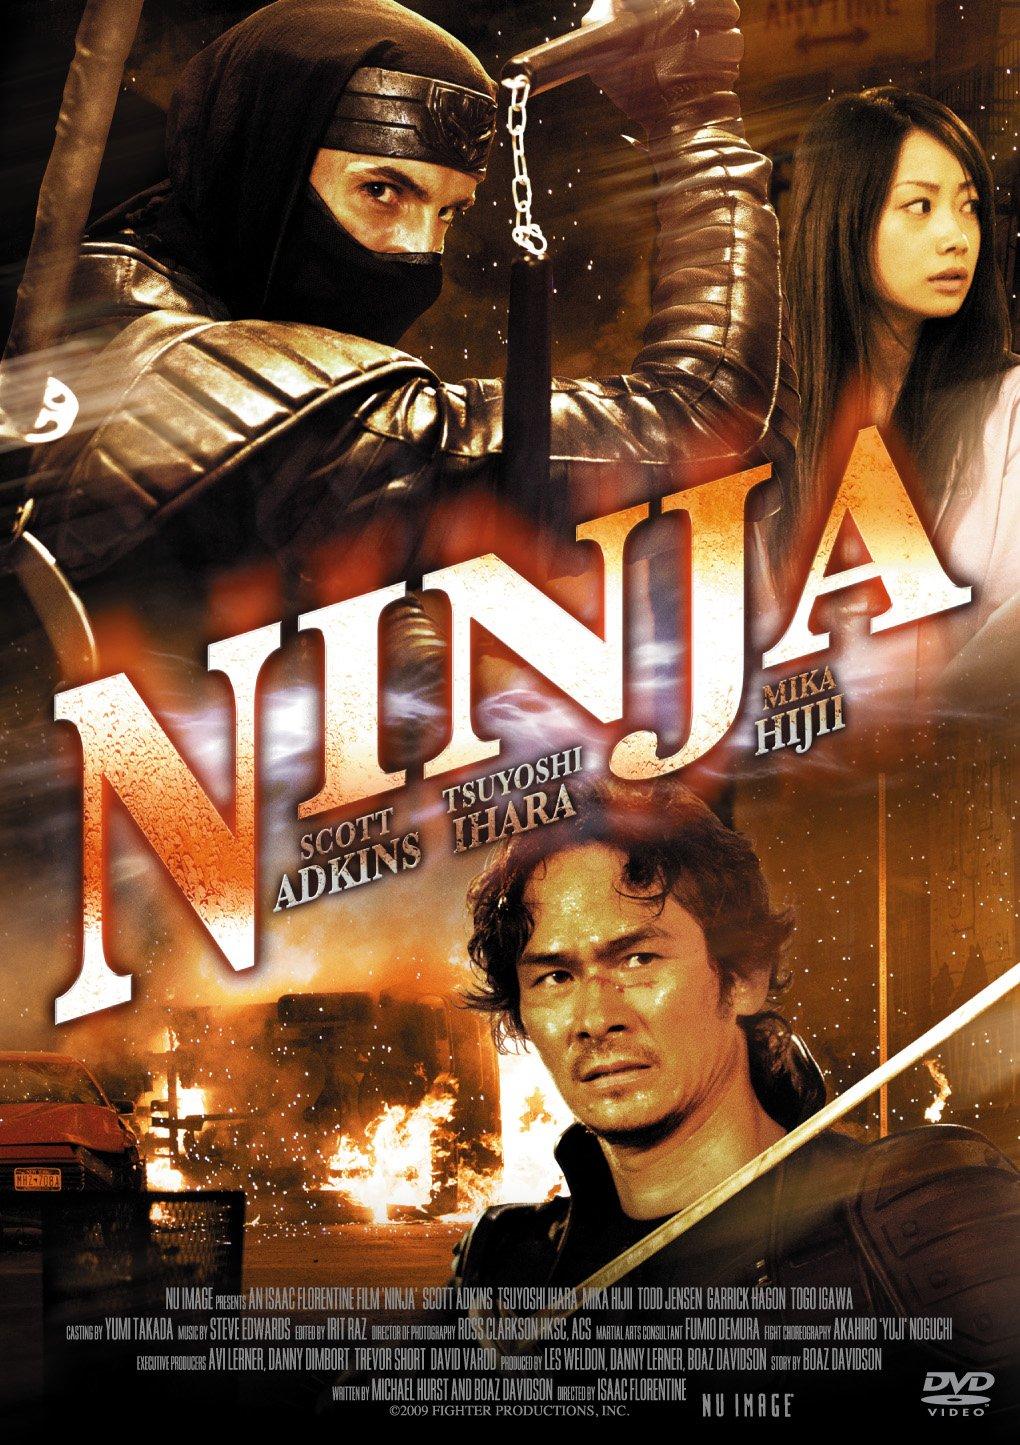 Amazon.com: Movie - Ninja [Japan DVD] BBBN-1069: Cine y TV